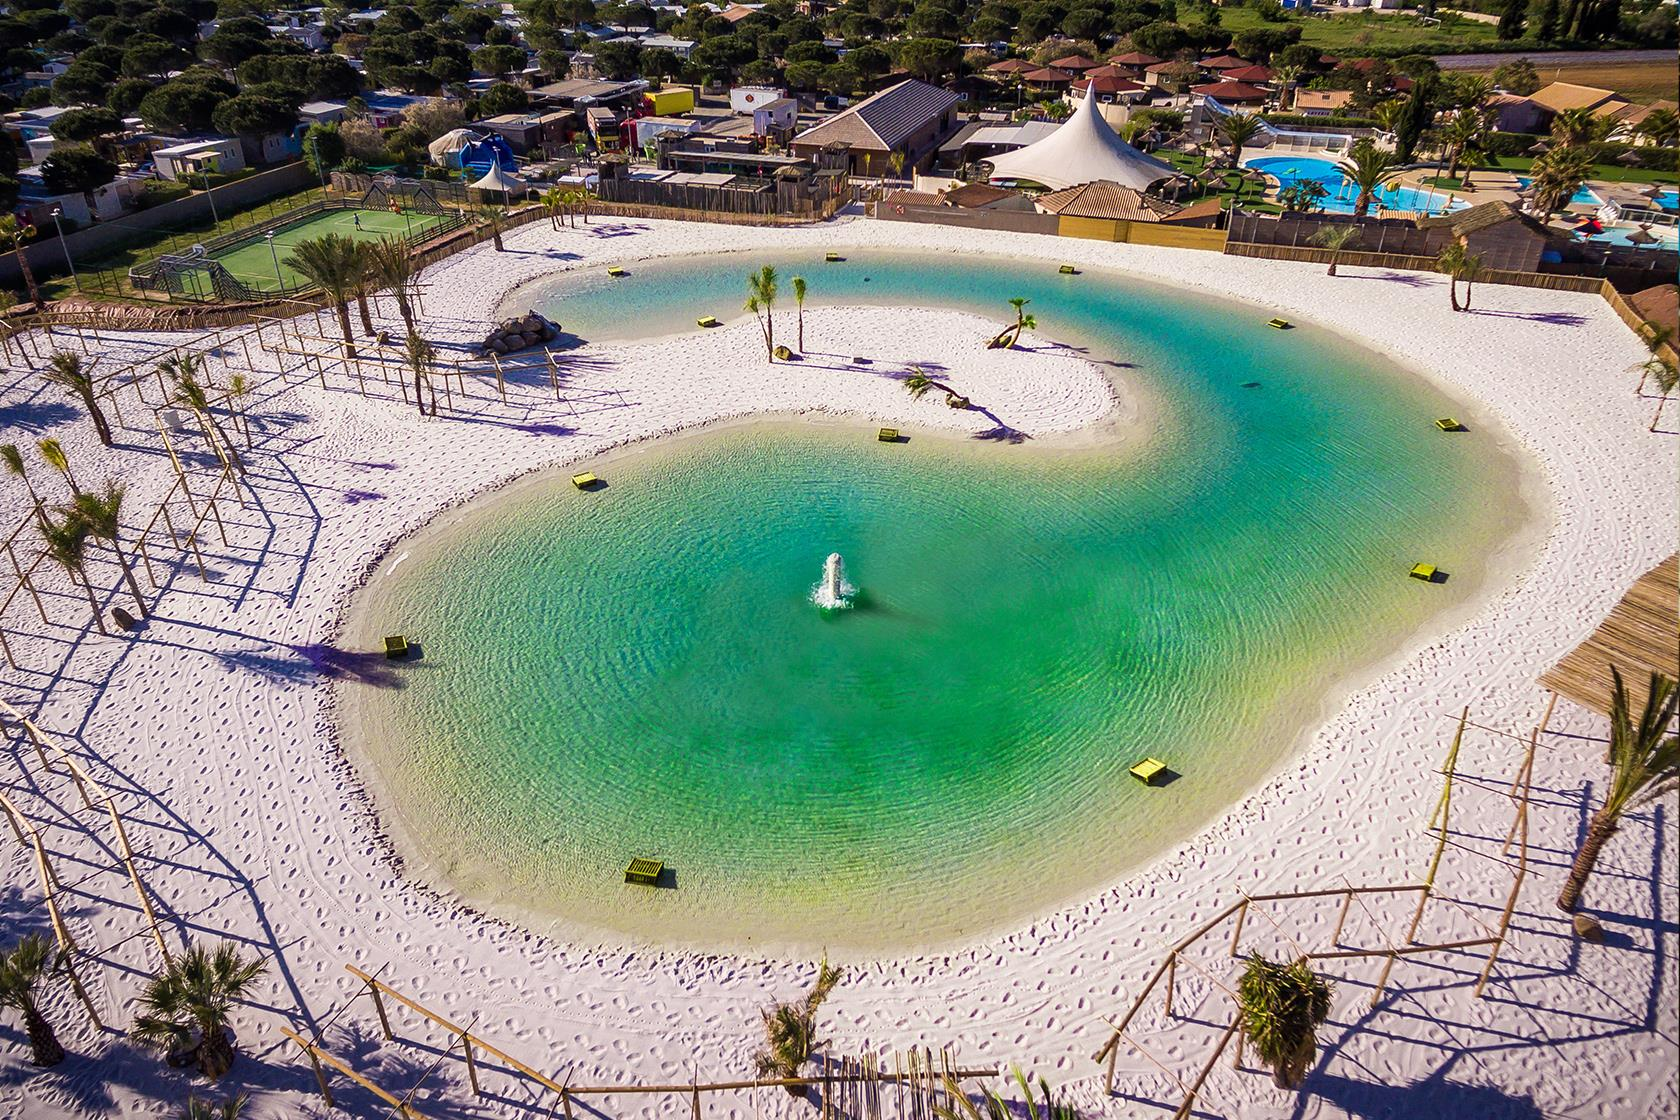 Sandy Beach and Lagoon Pool Landscape